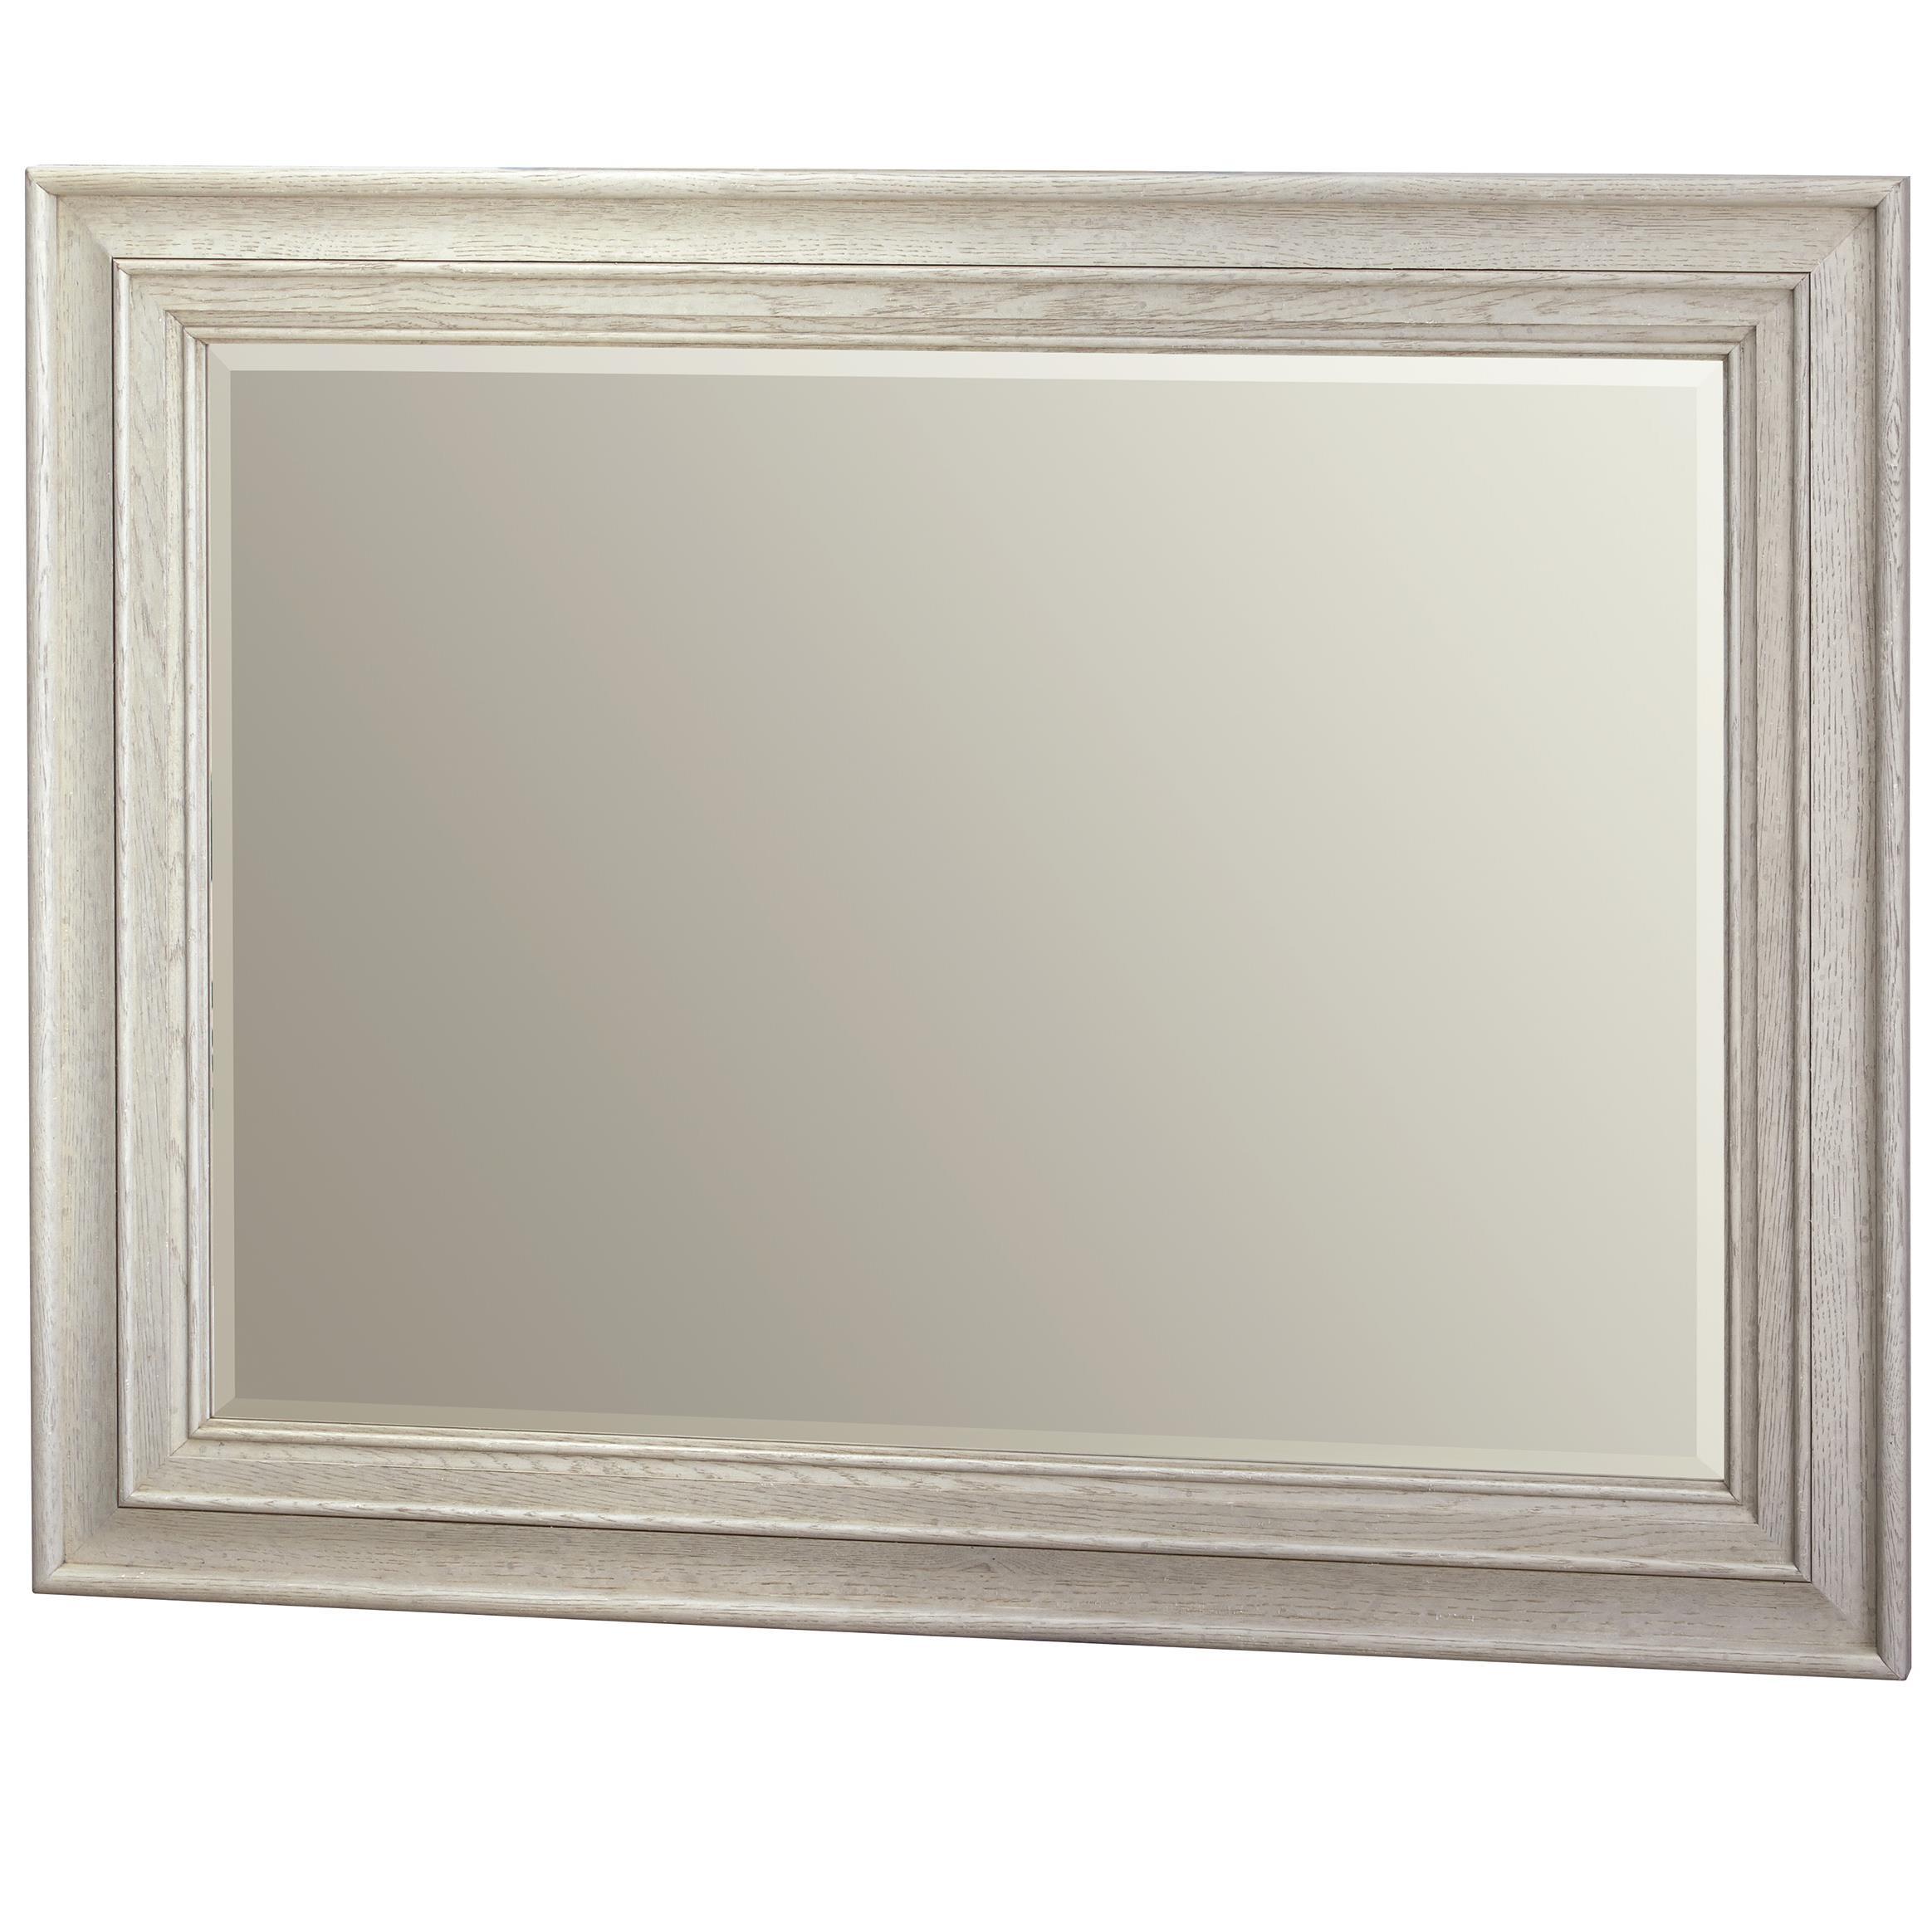 Universal California - Malibu Landscape Mirror - Item Number: 47604M